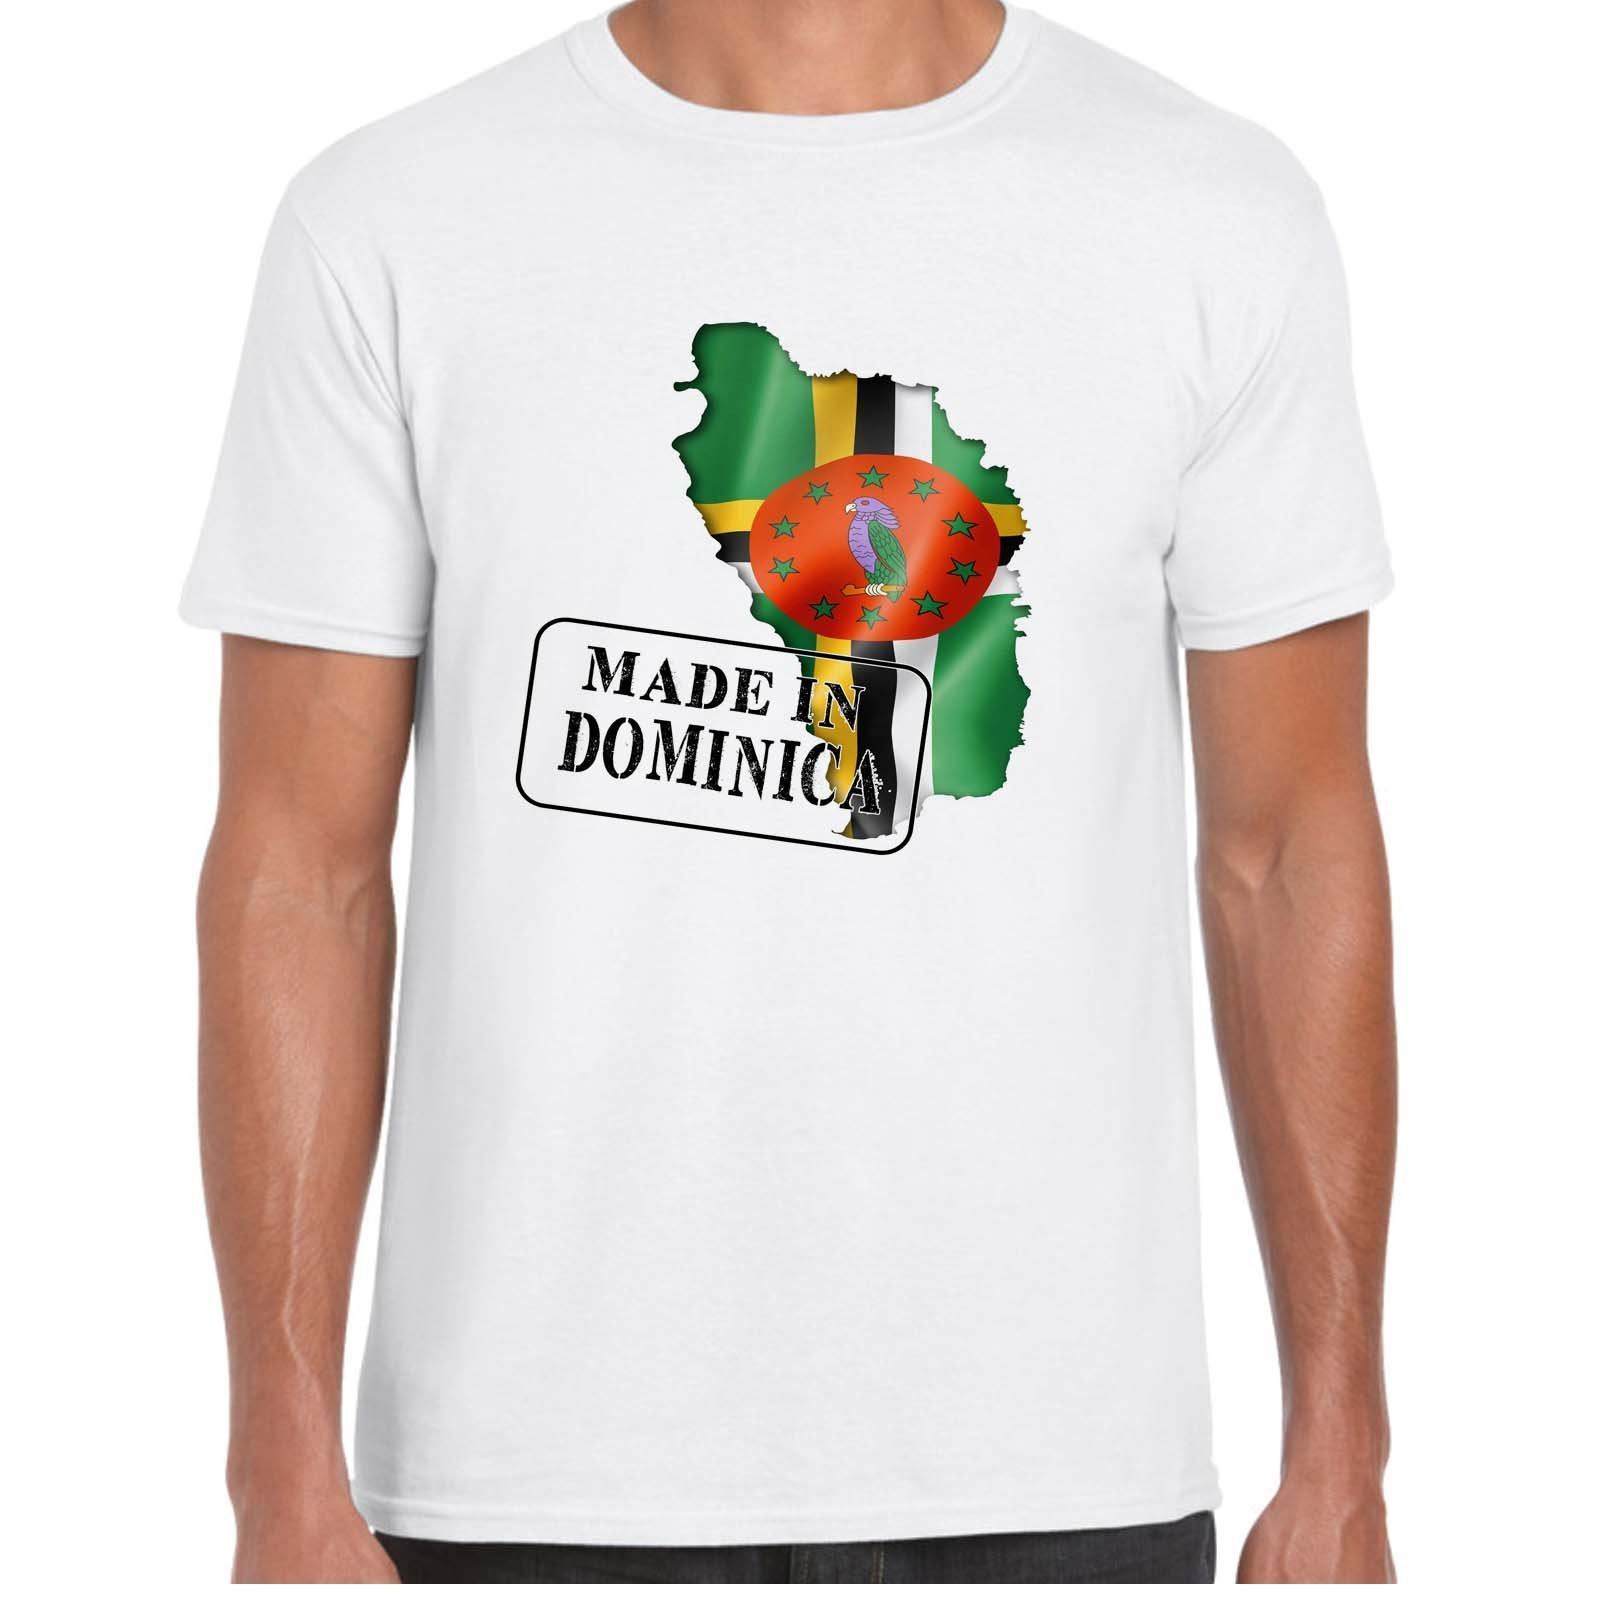 Fabrique en DOMINICA-Drapeau et Carta-Camiseta pour hommes harajuku Verano de 2018 camiseta